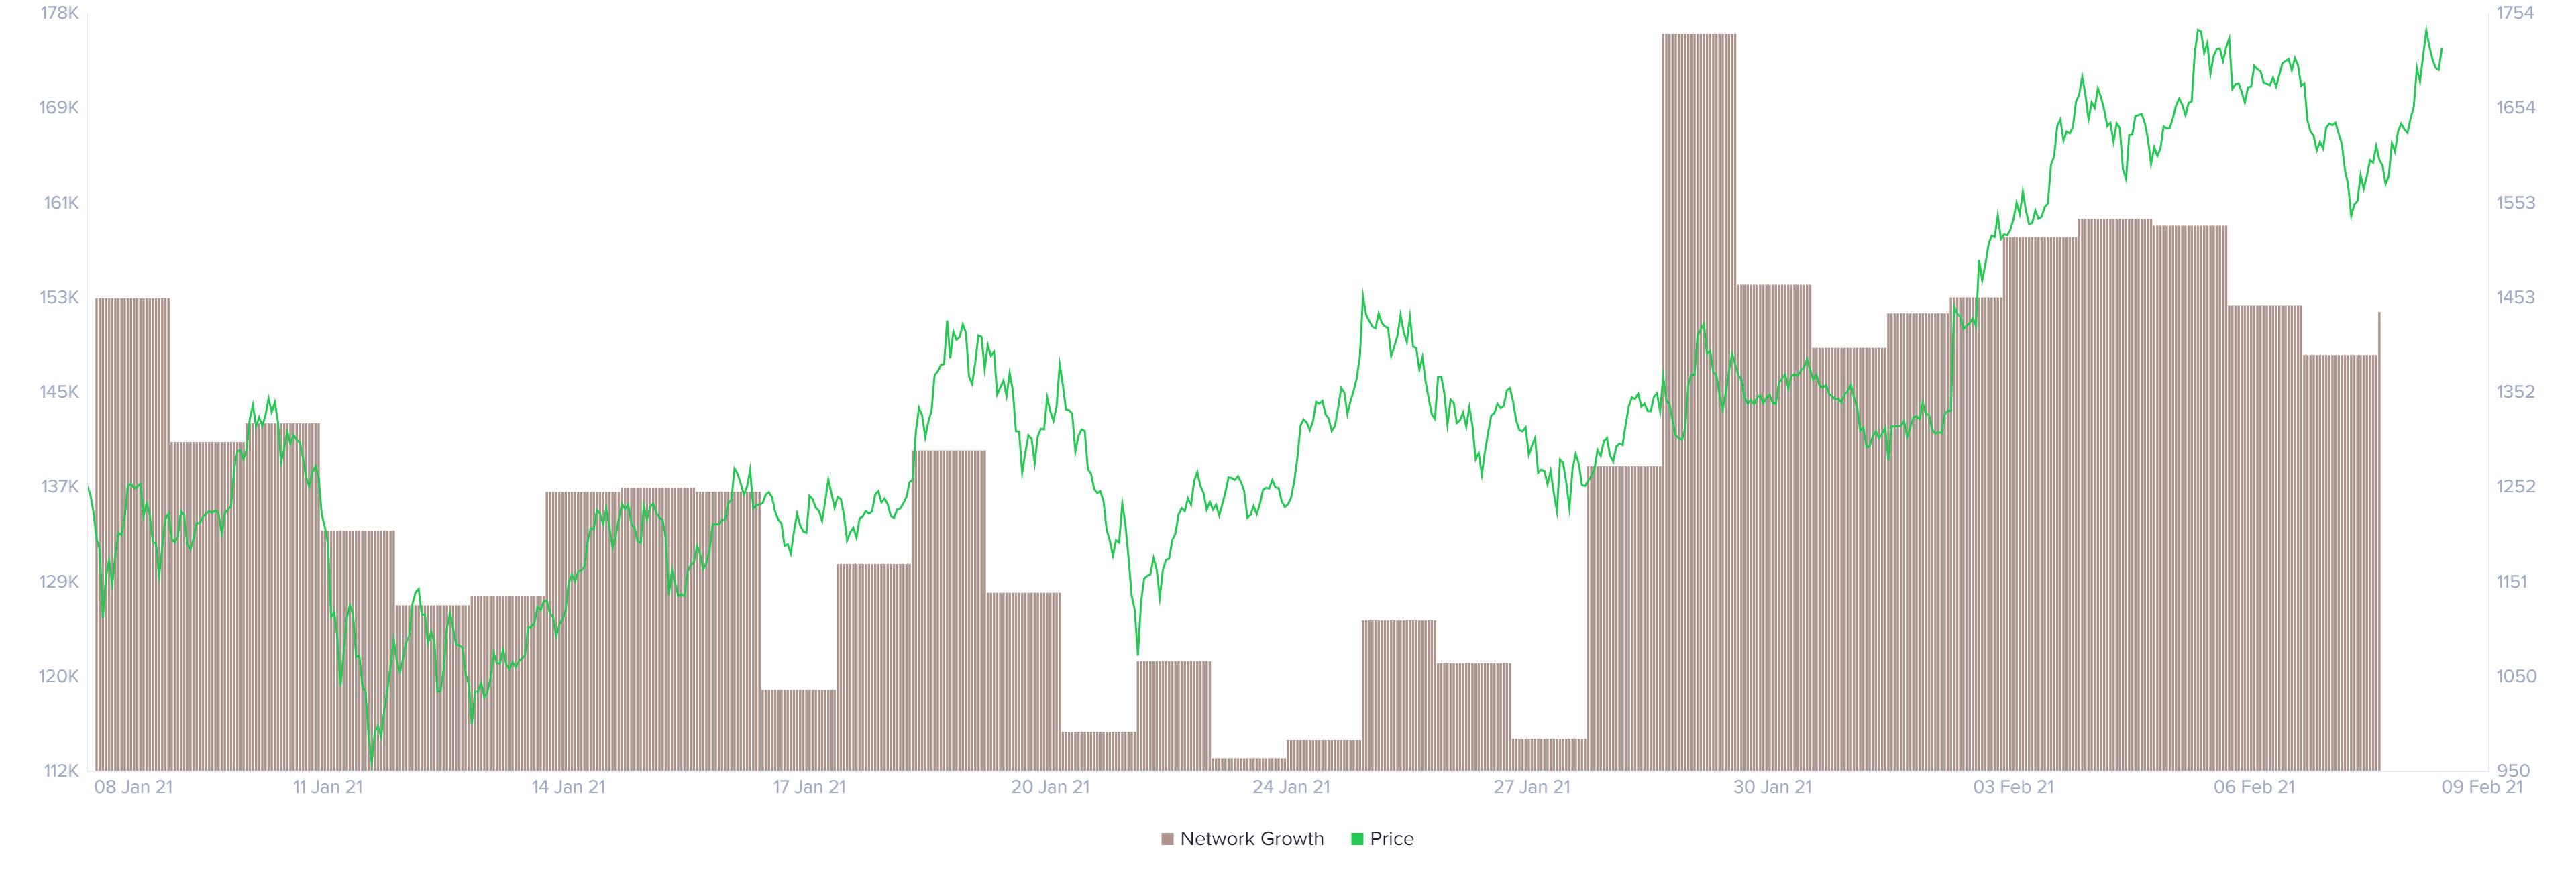 Ethereum network growth